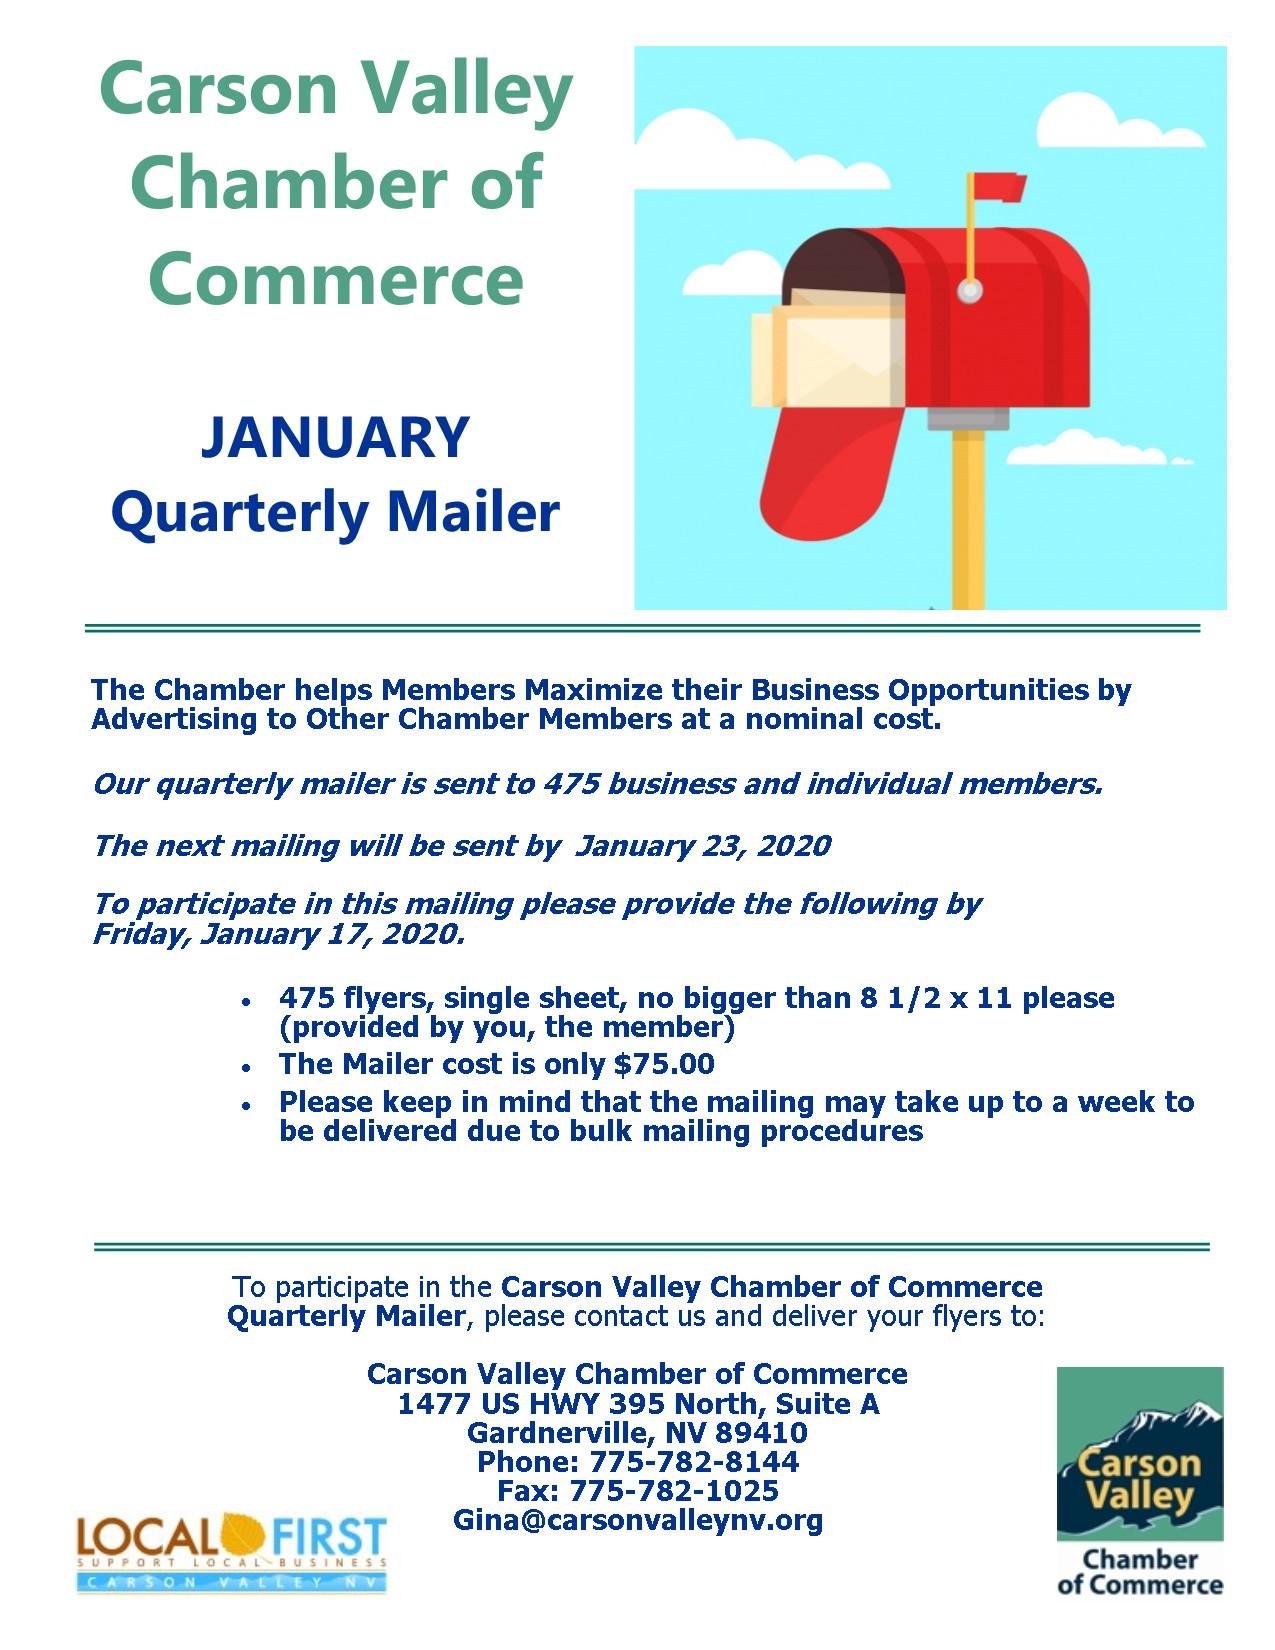 January Quarterly Mailer Flyer 2020